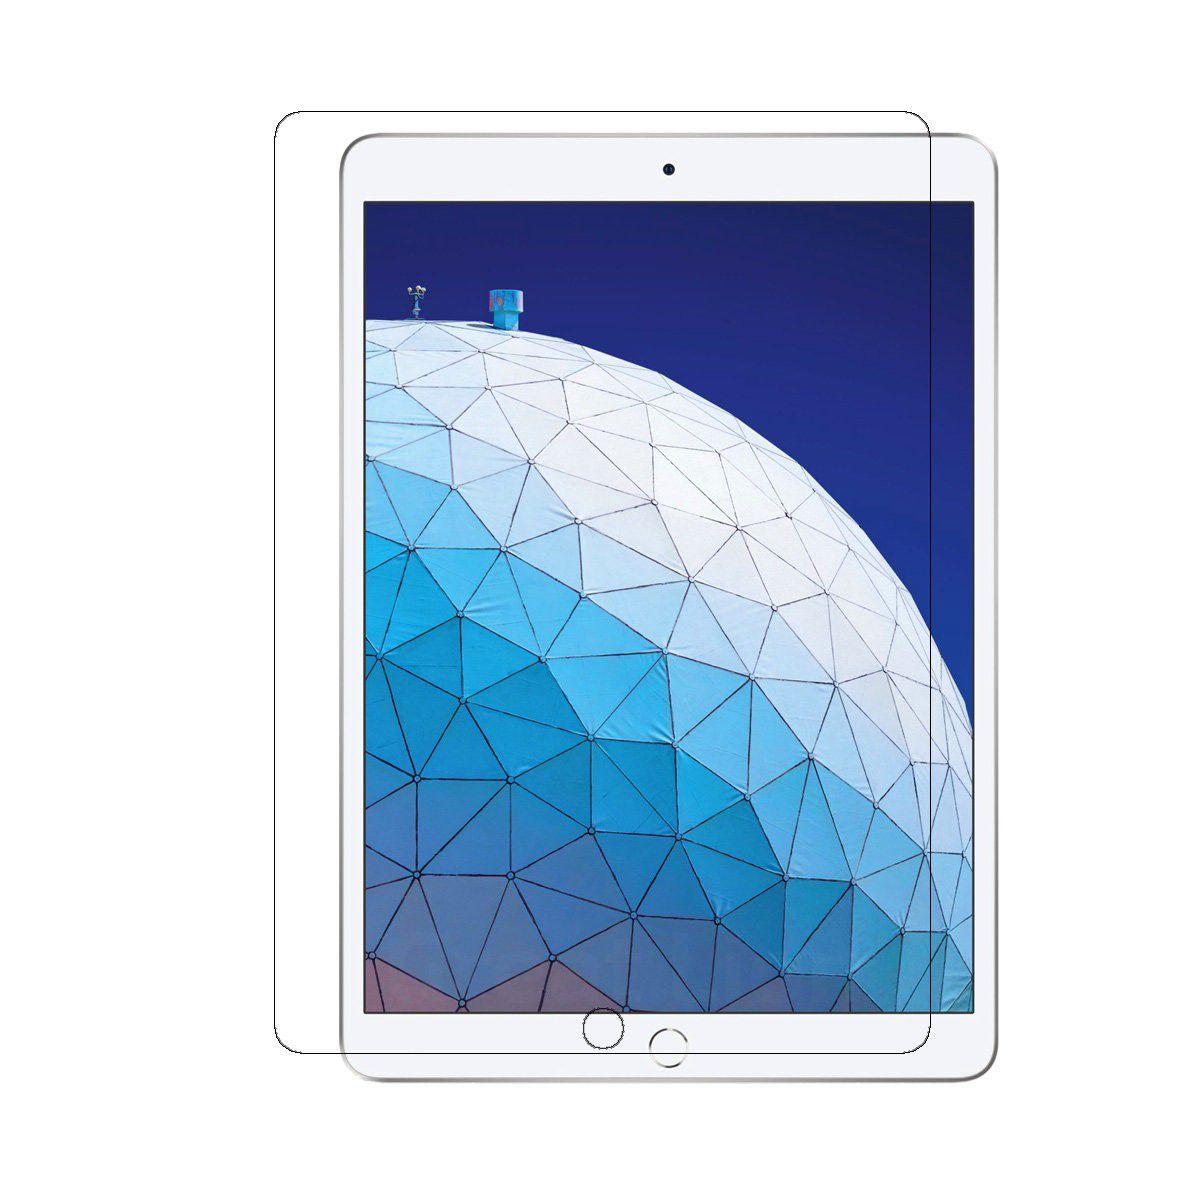 Kit Smart Case Ipad 7 Tela 10.2 A2197 A2198 A2199 Preta + Película de Vidro